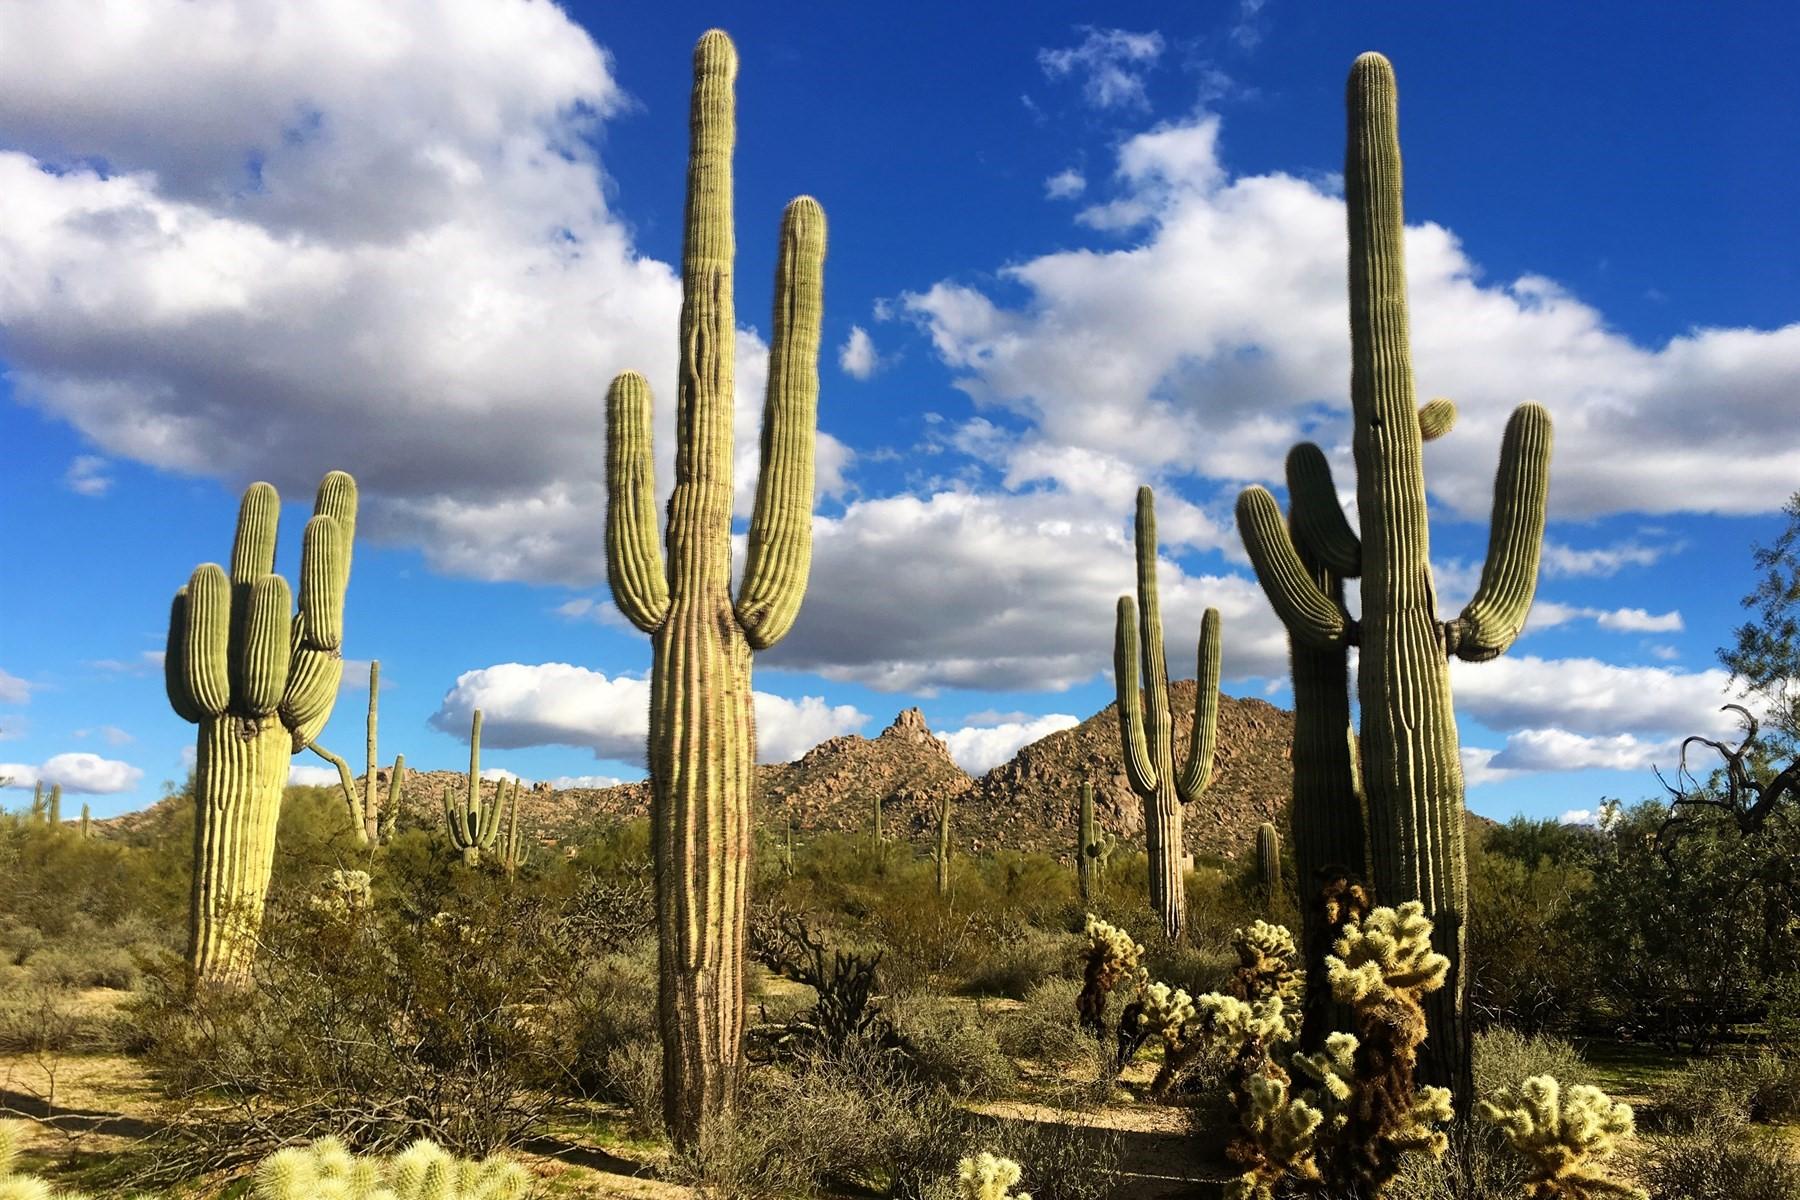 Terreno para Venda às Prestigious Section 31 five-acre homesite with equestrian privileges 27087 N 90th St Scottsdale, Arizona, 85262 Estados Unidos